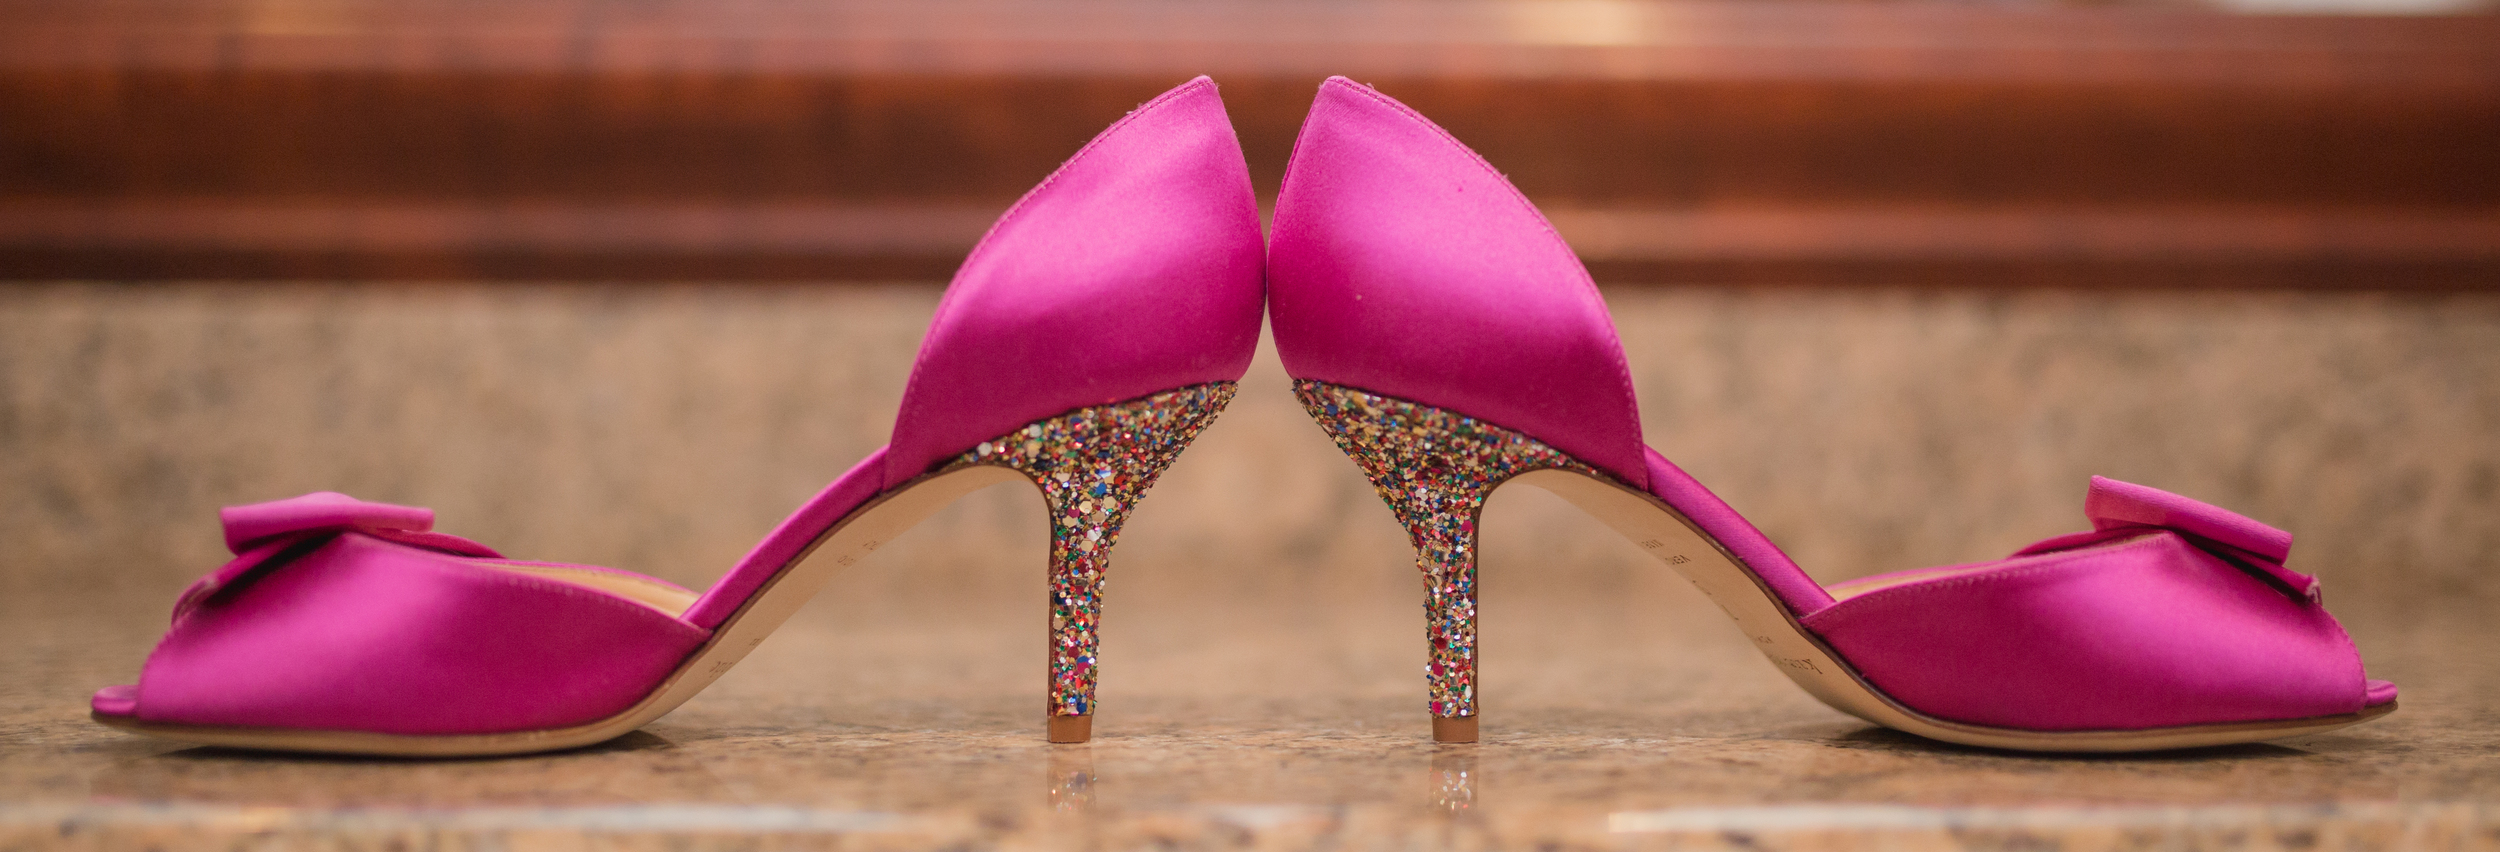 10shoes.jpg